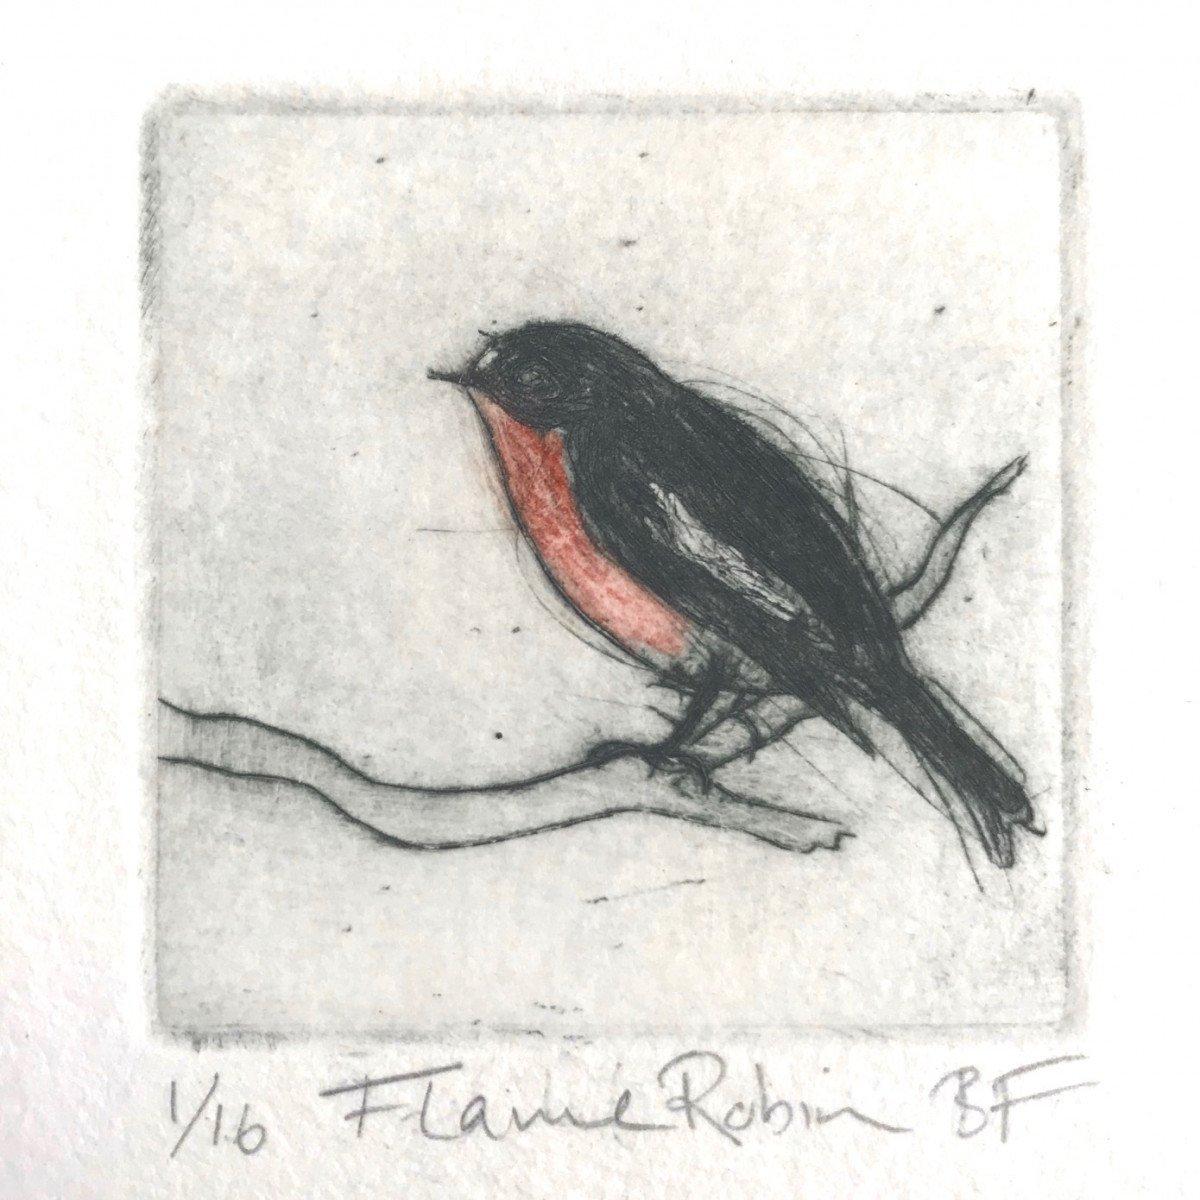 Flame Robin - Bridget Farmer